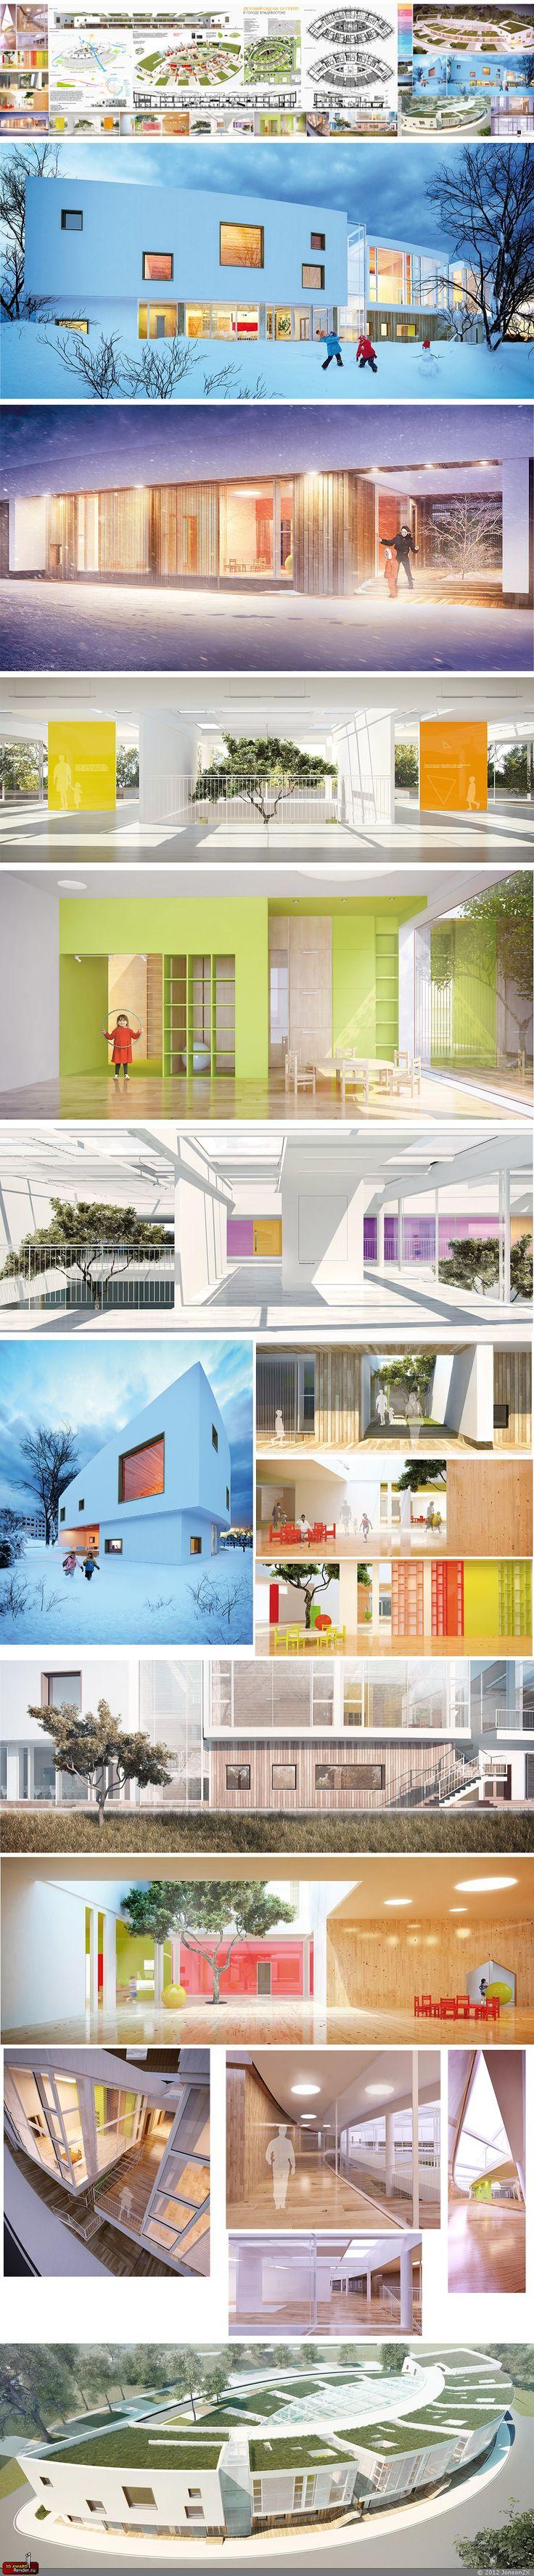 114 Best School Spaces Images On Pinterest